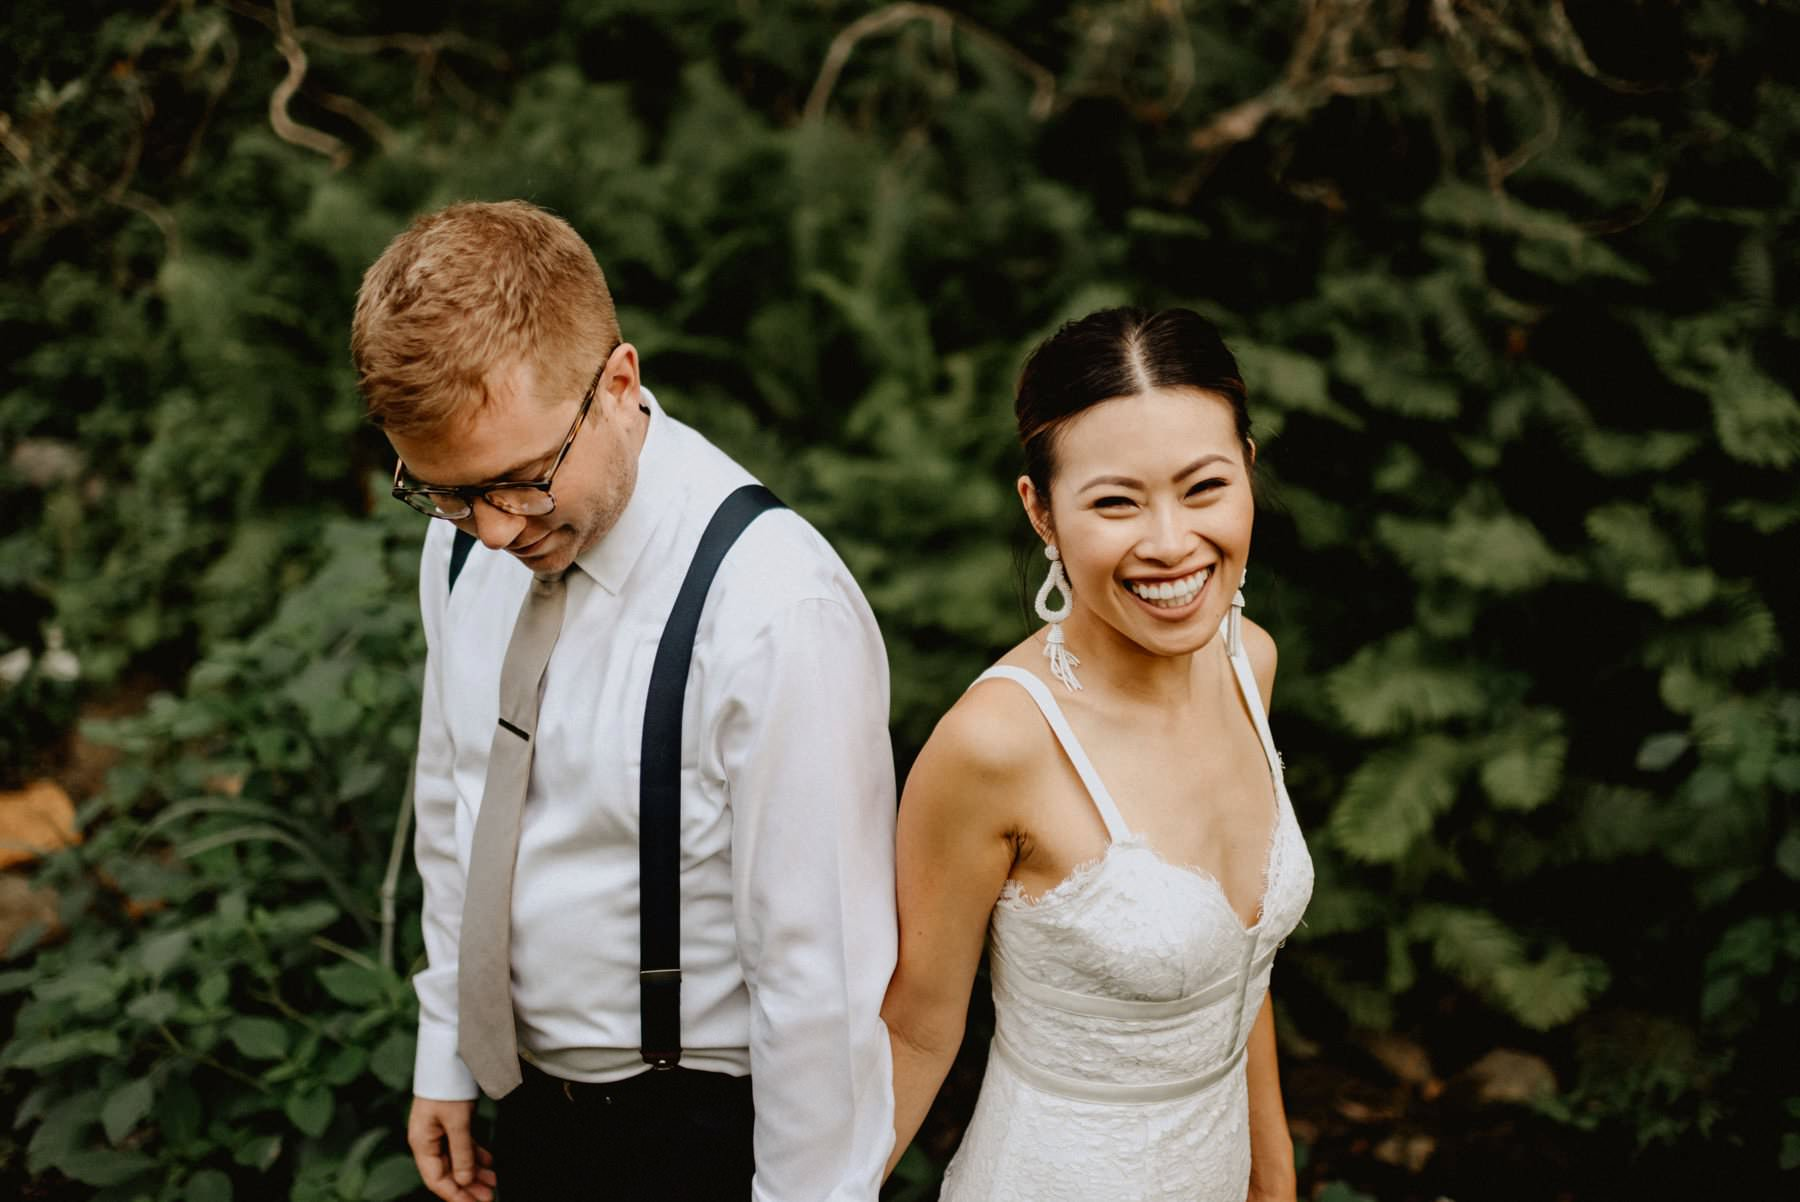 Appleford-estate-wedding-135.jpg